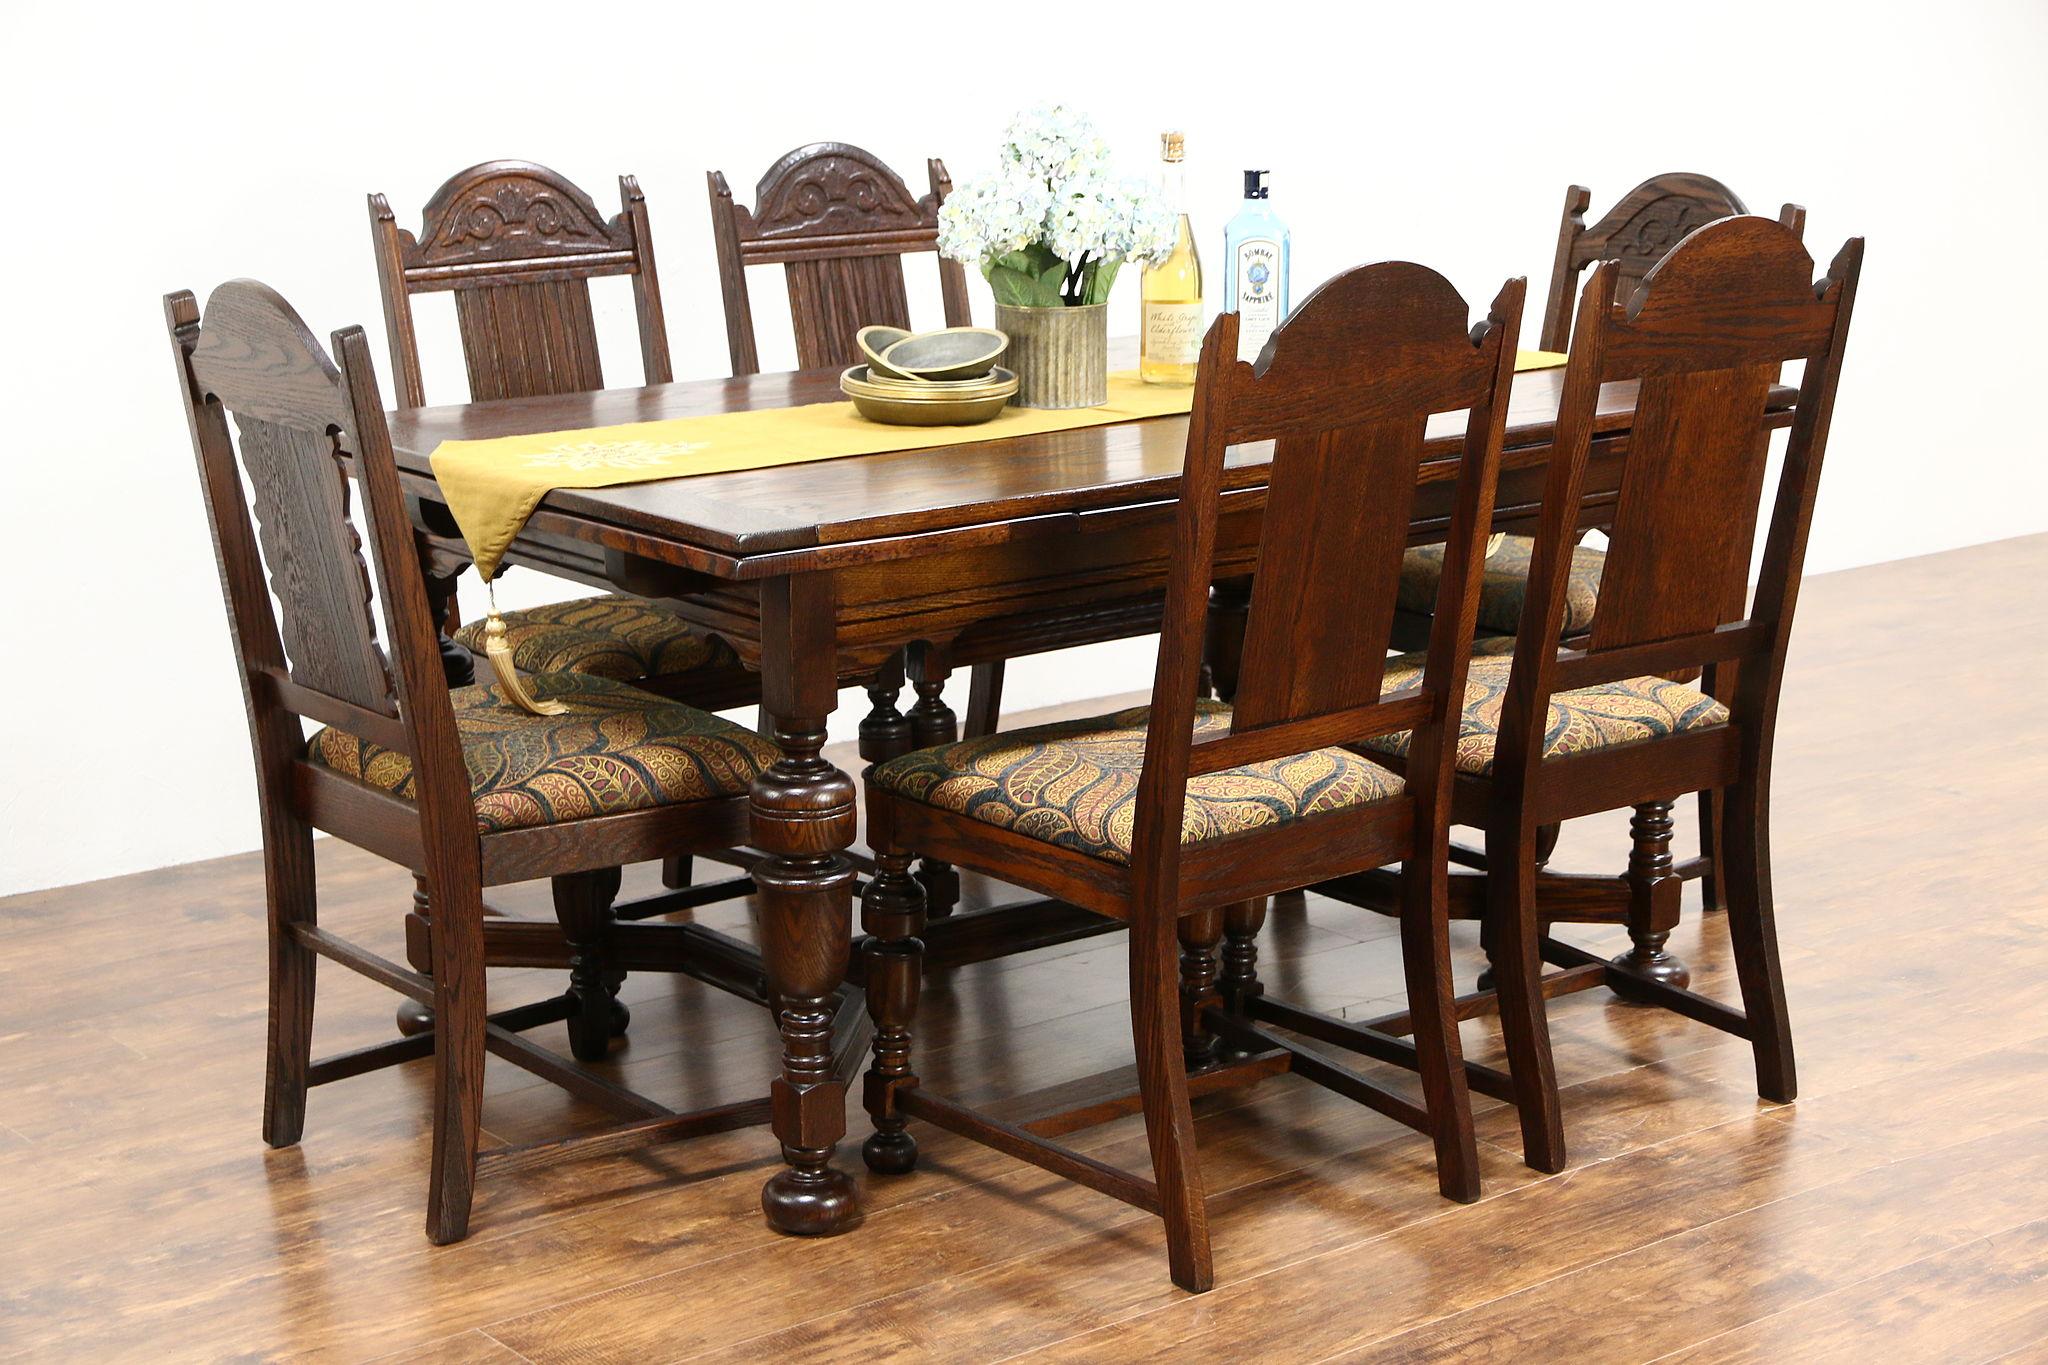 Images Of Antique Dining Room Furniture, Antique Dining Room Sets